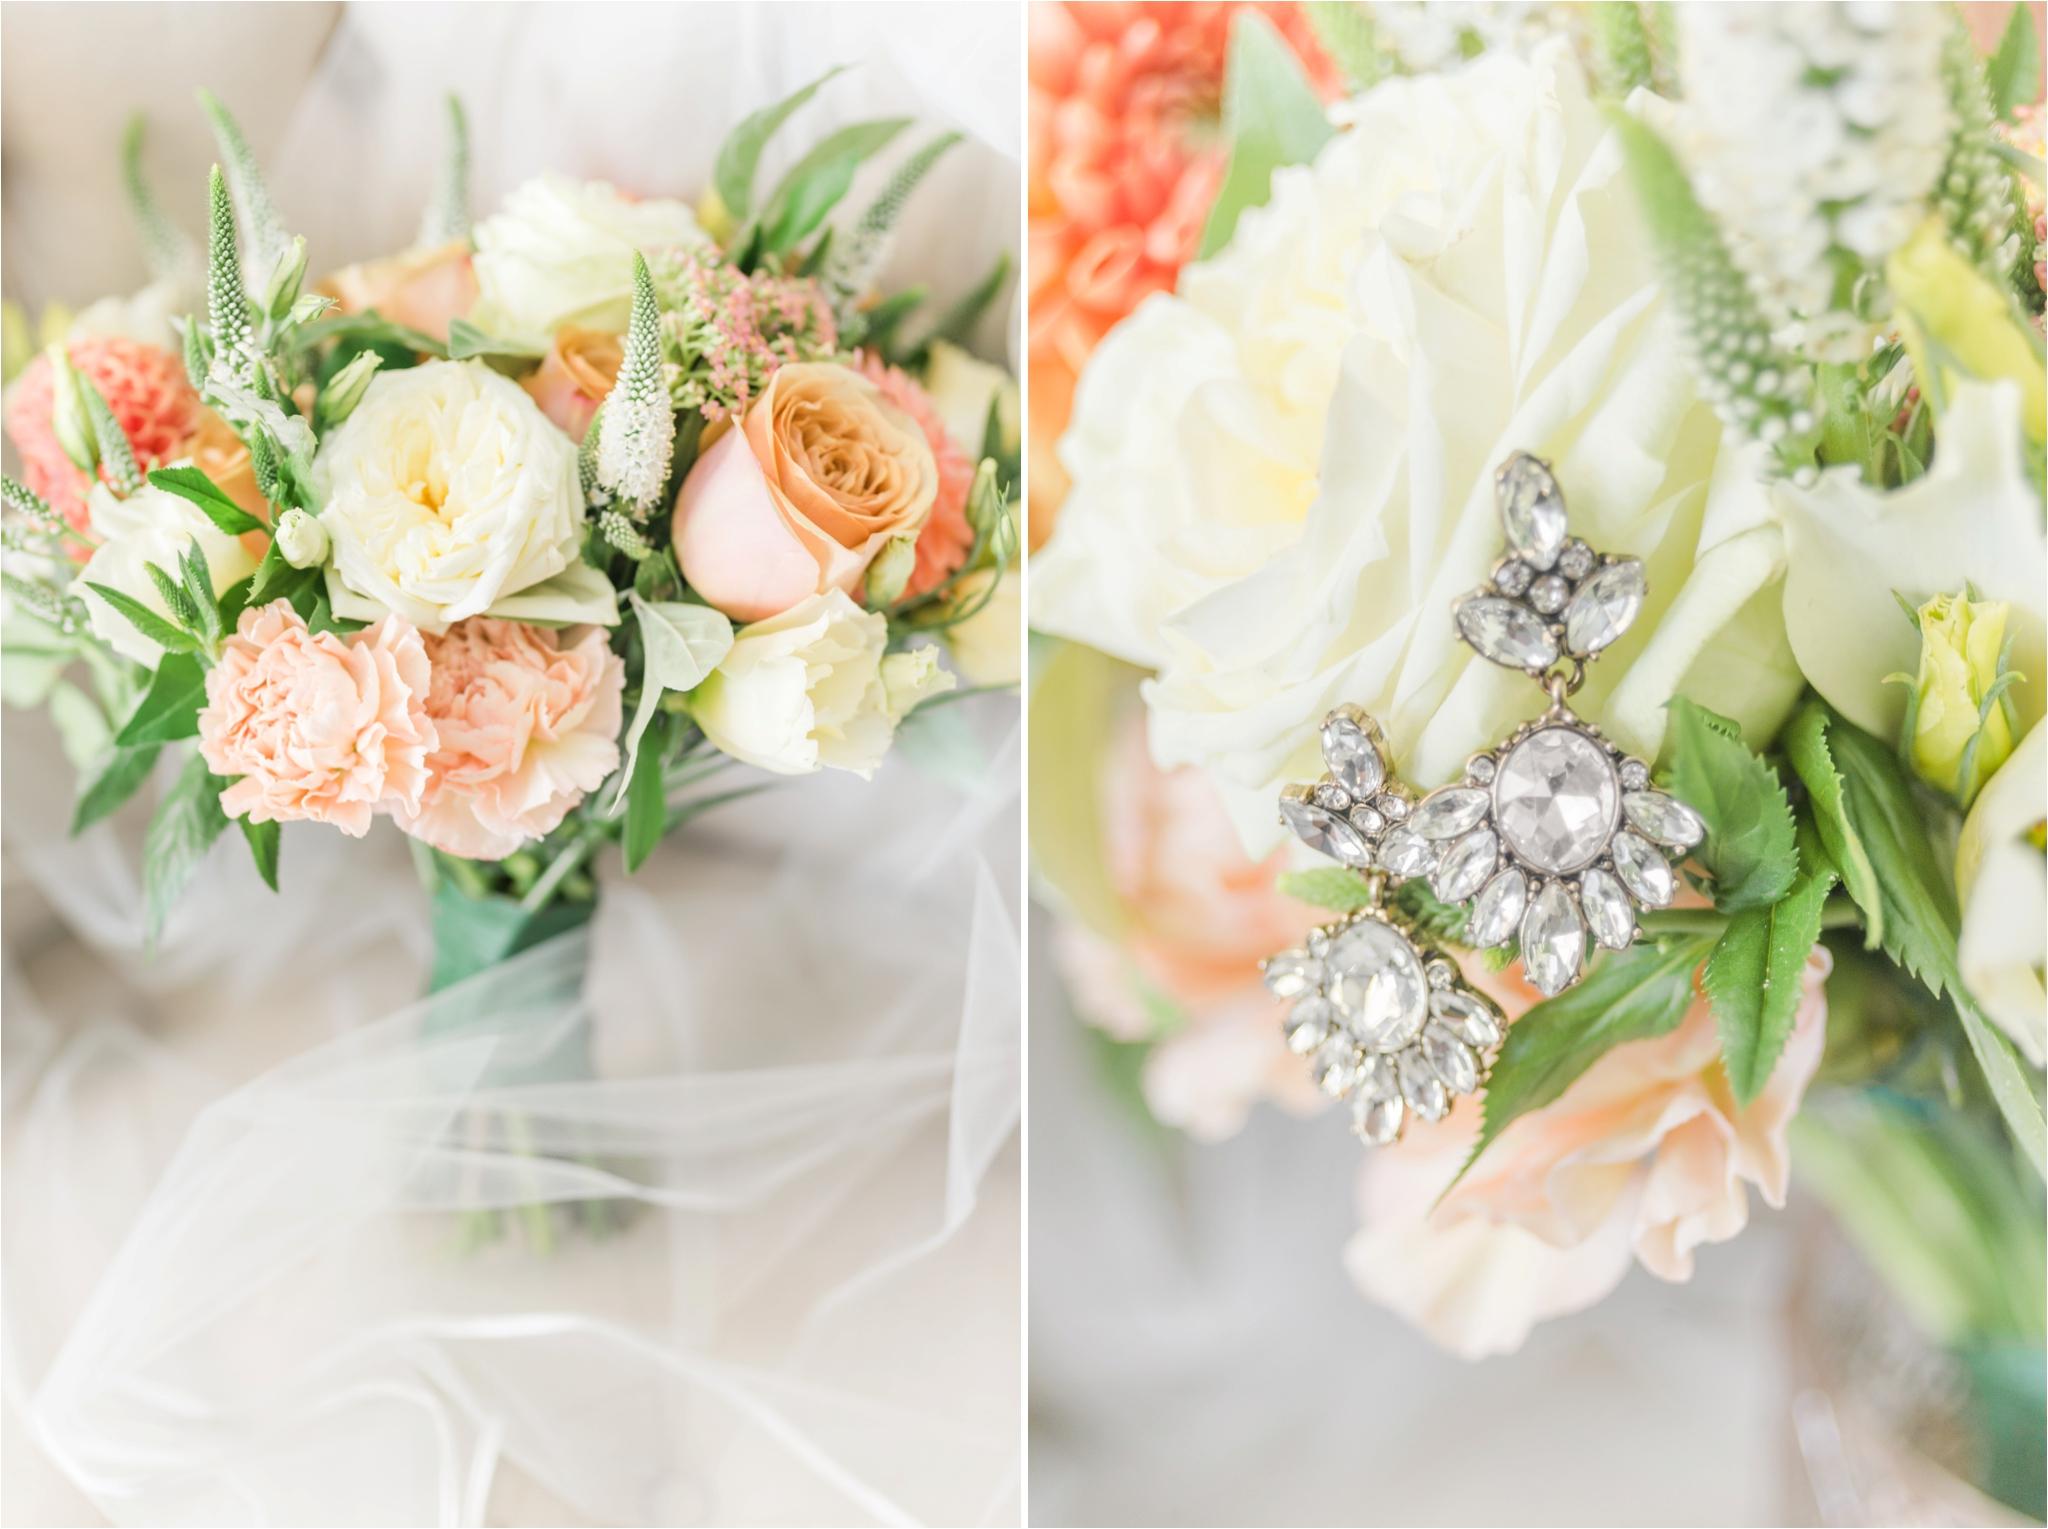 Bridal Details Raleigh North Carolina Wedding Photographer Jaclyn Auletta Photography